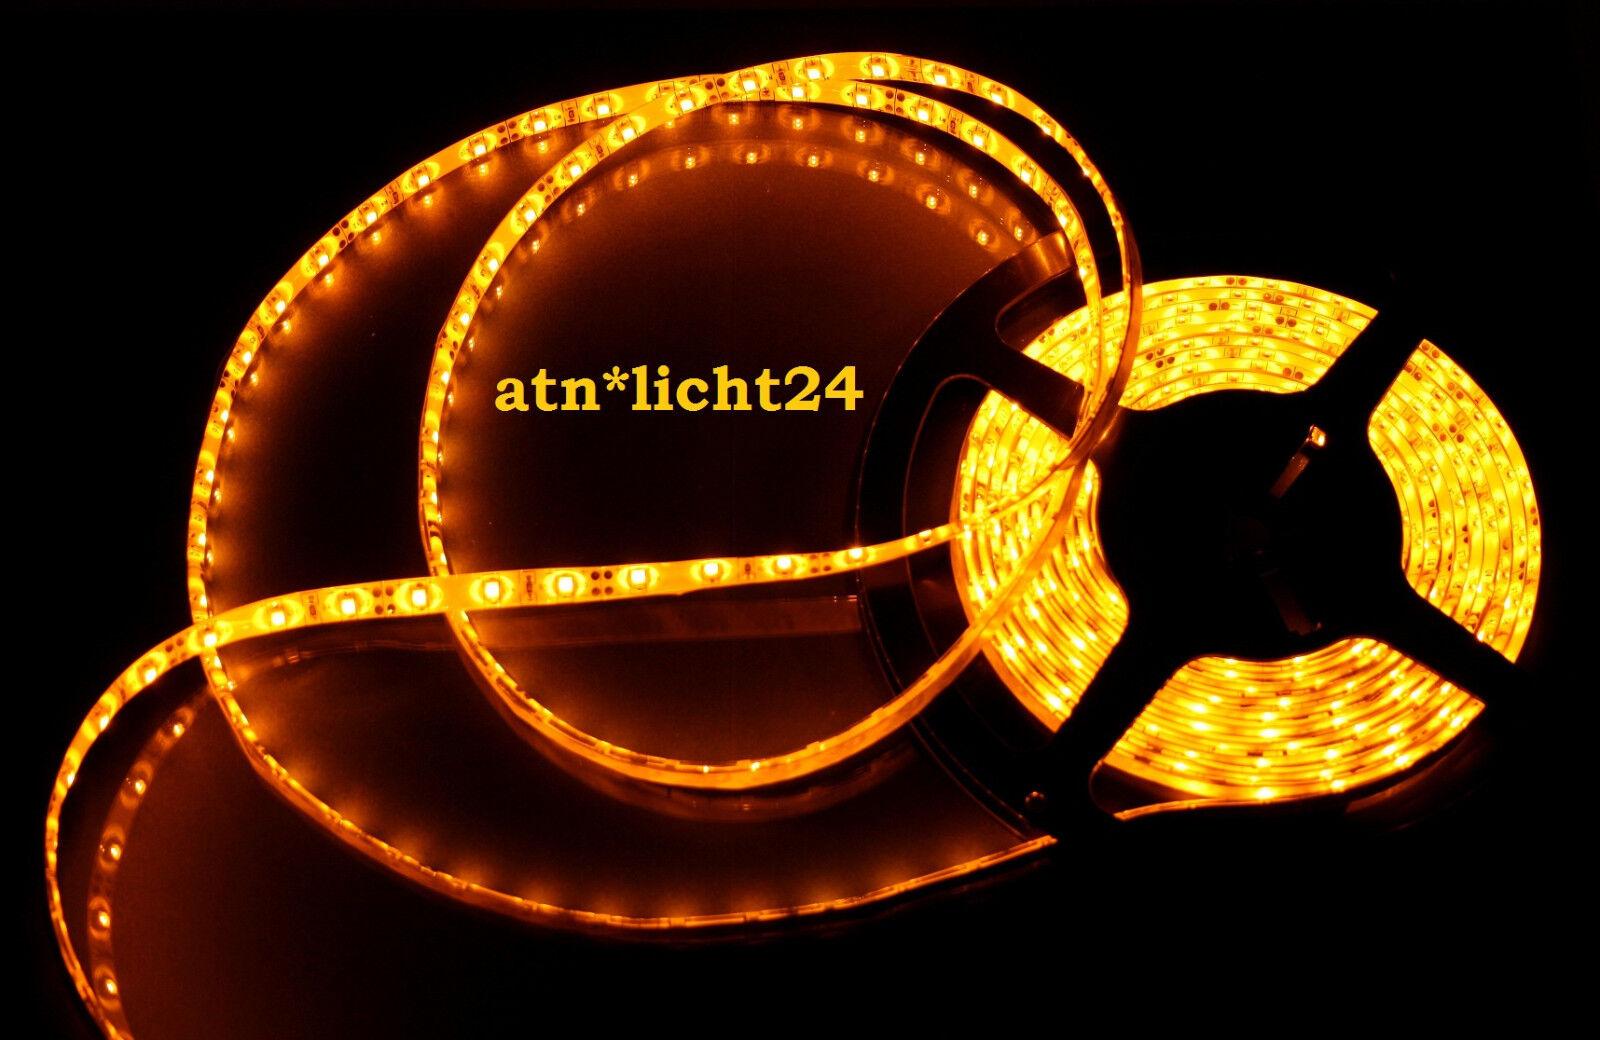 LED autoadhesivo barra strip barra de luz 24v camión trucks regulable funk dimmer